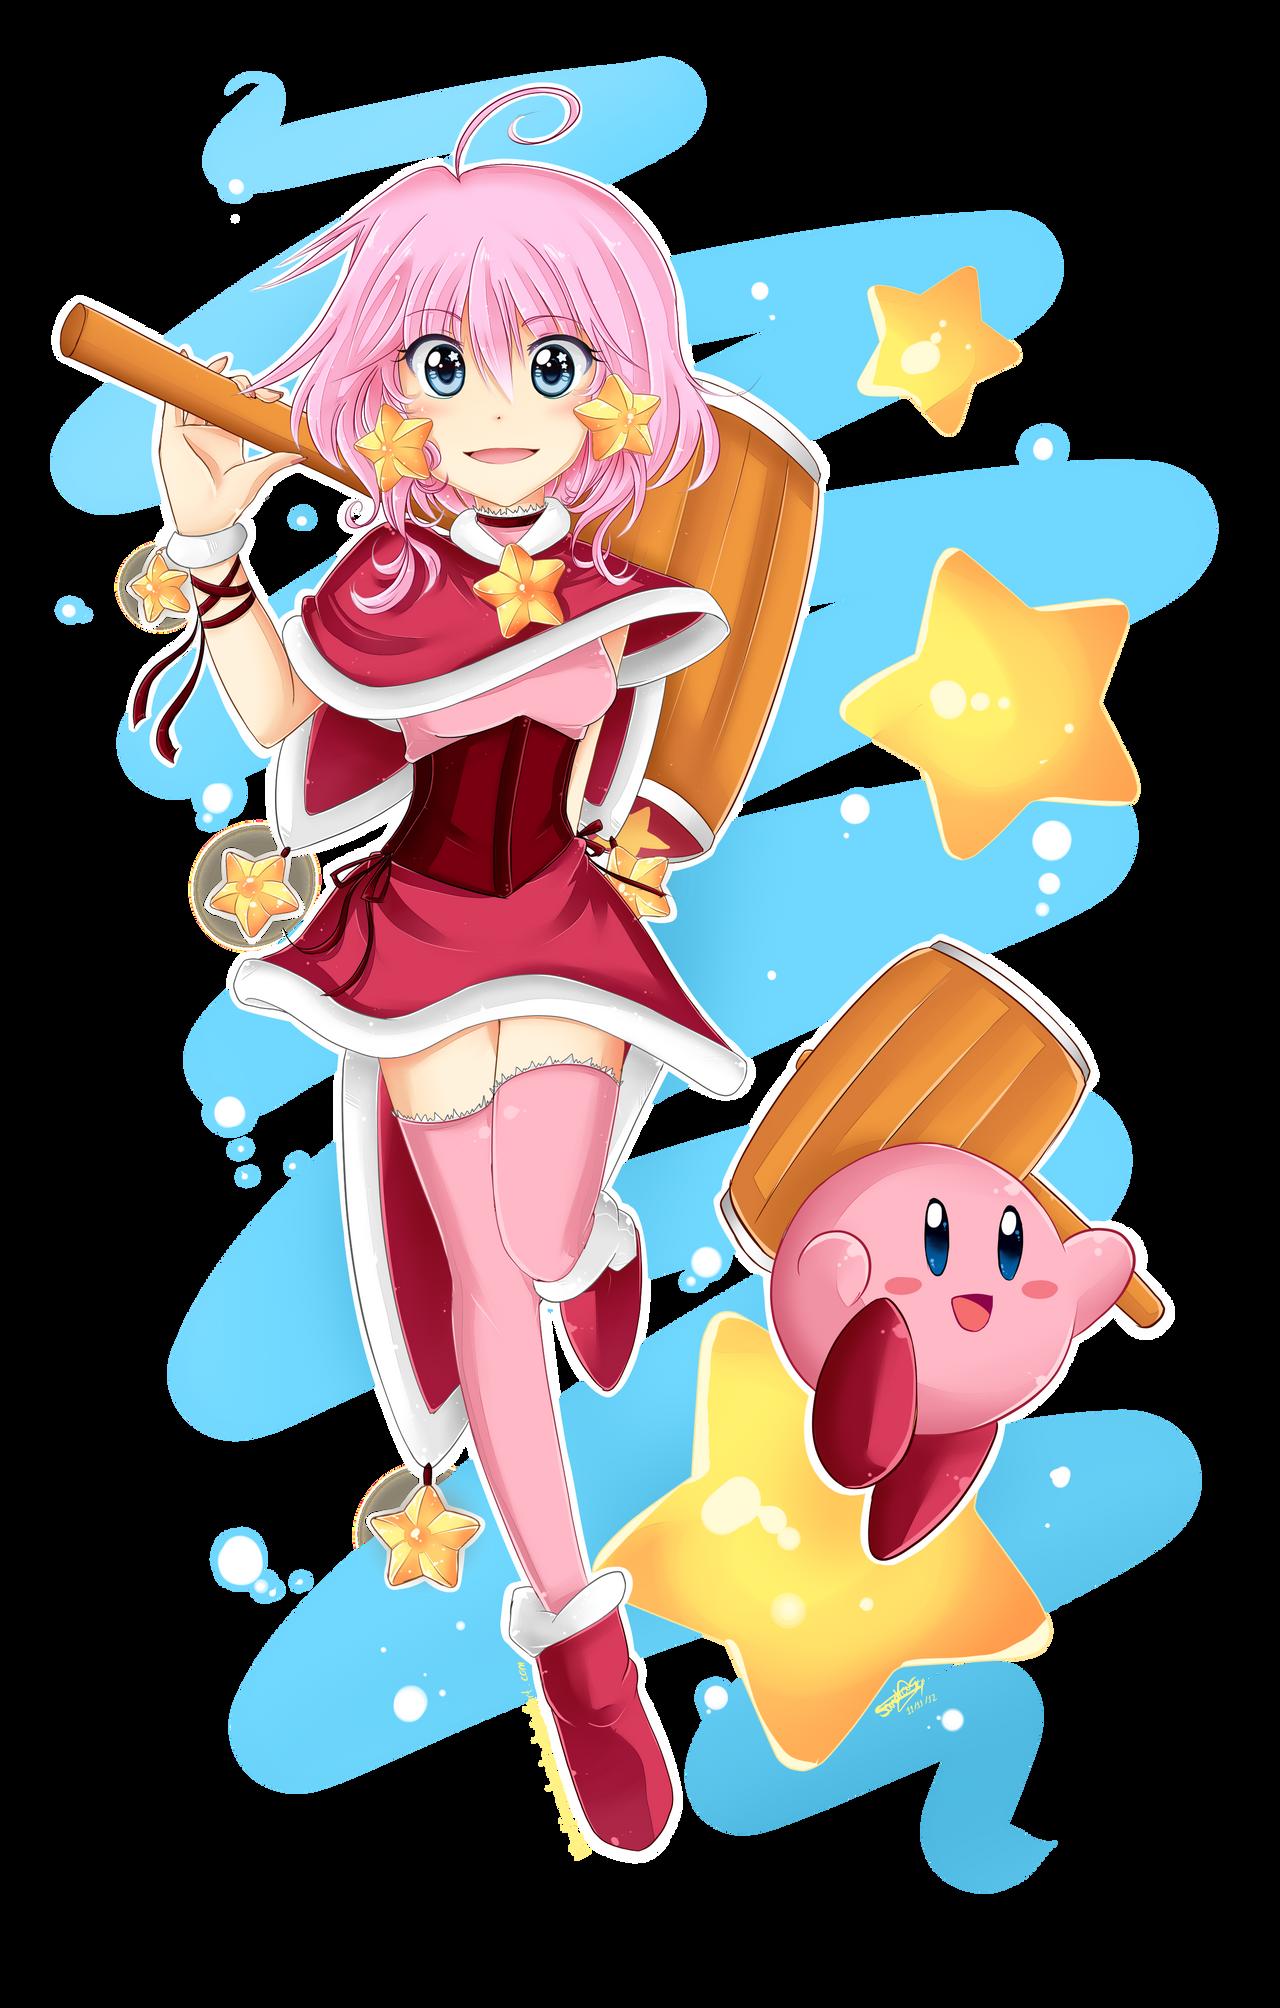 Kirby Human by SandraGH on DeviantArt